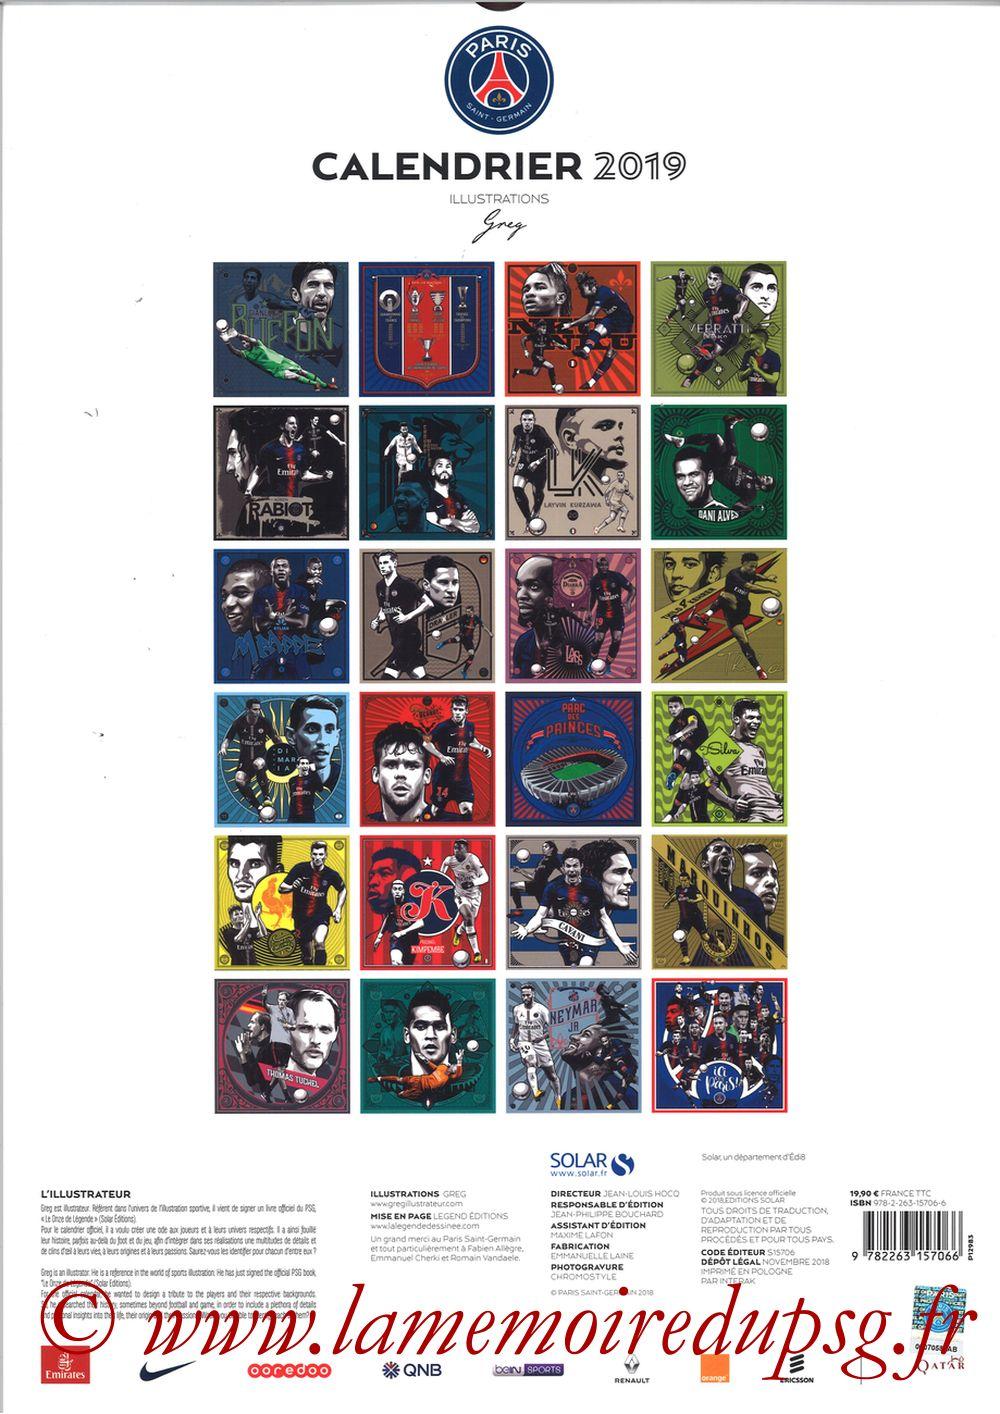 Calendrier PSG 2019 - Page 25 - Dos Album